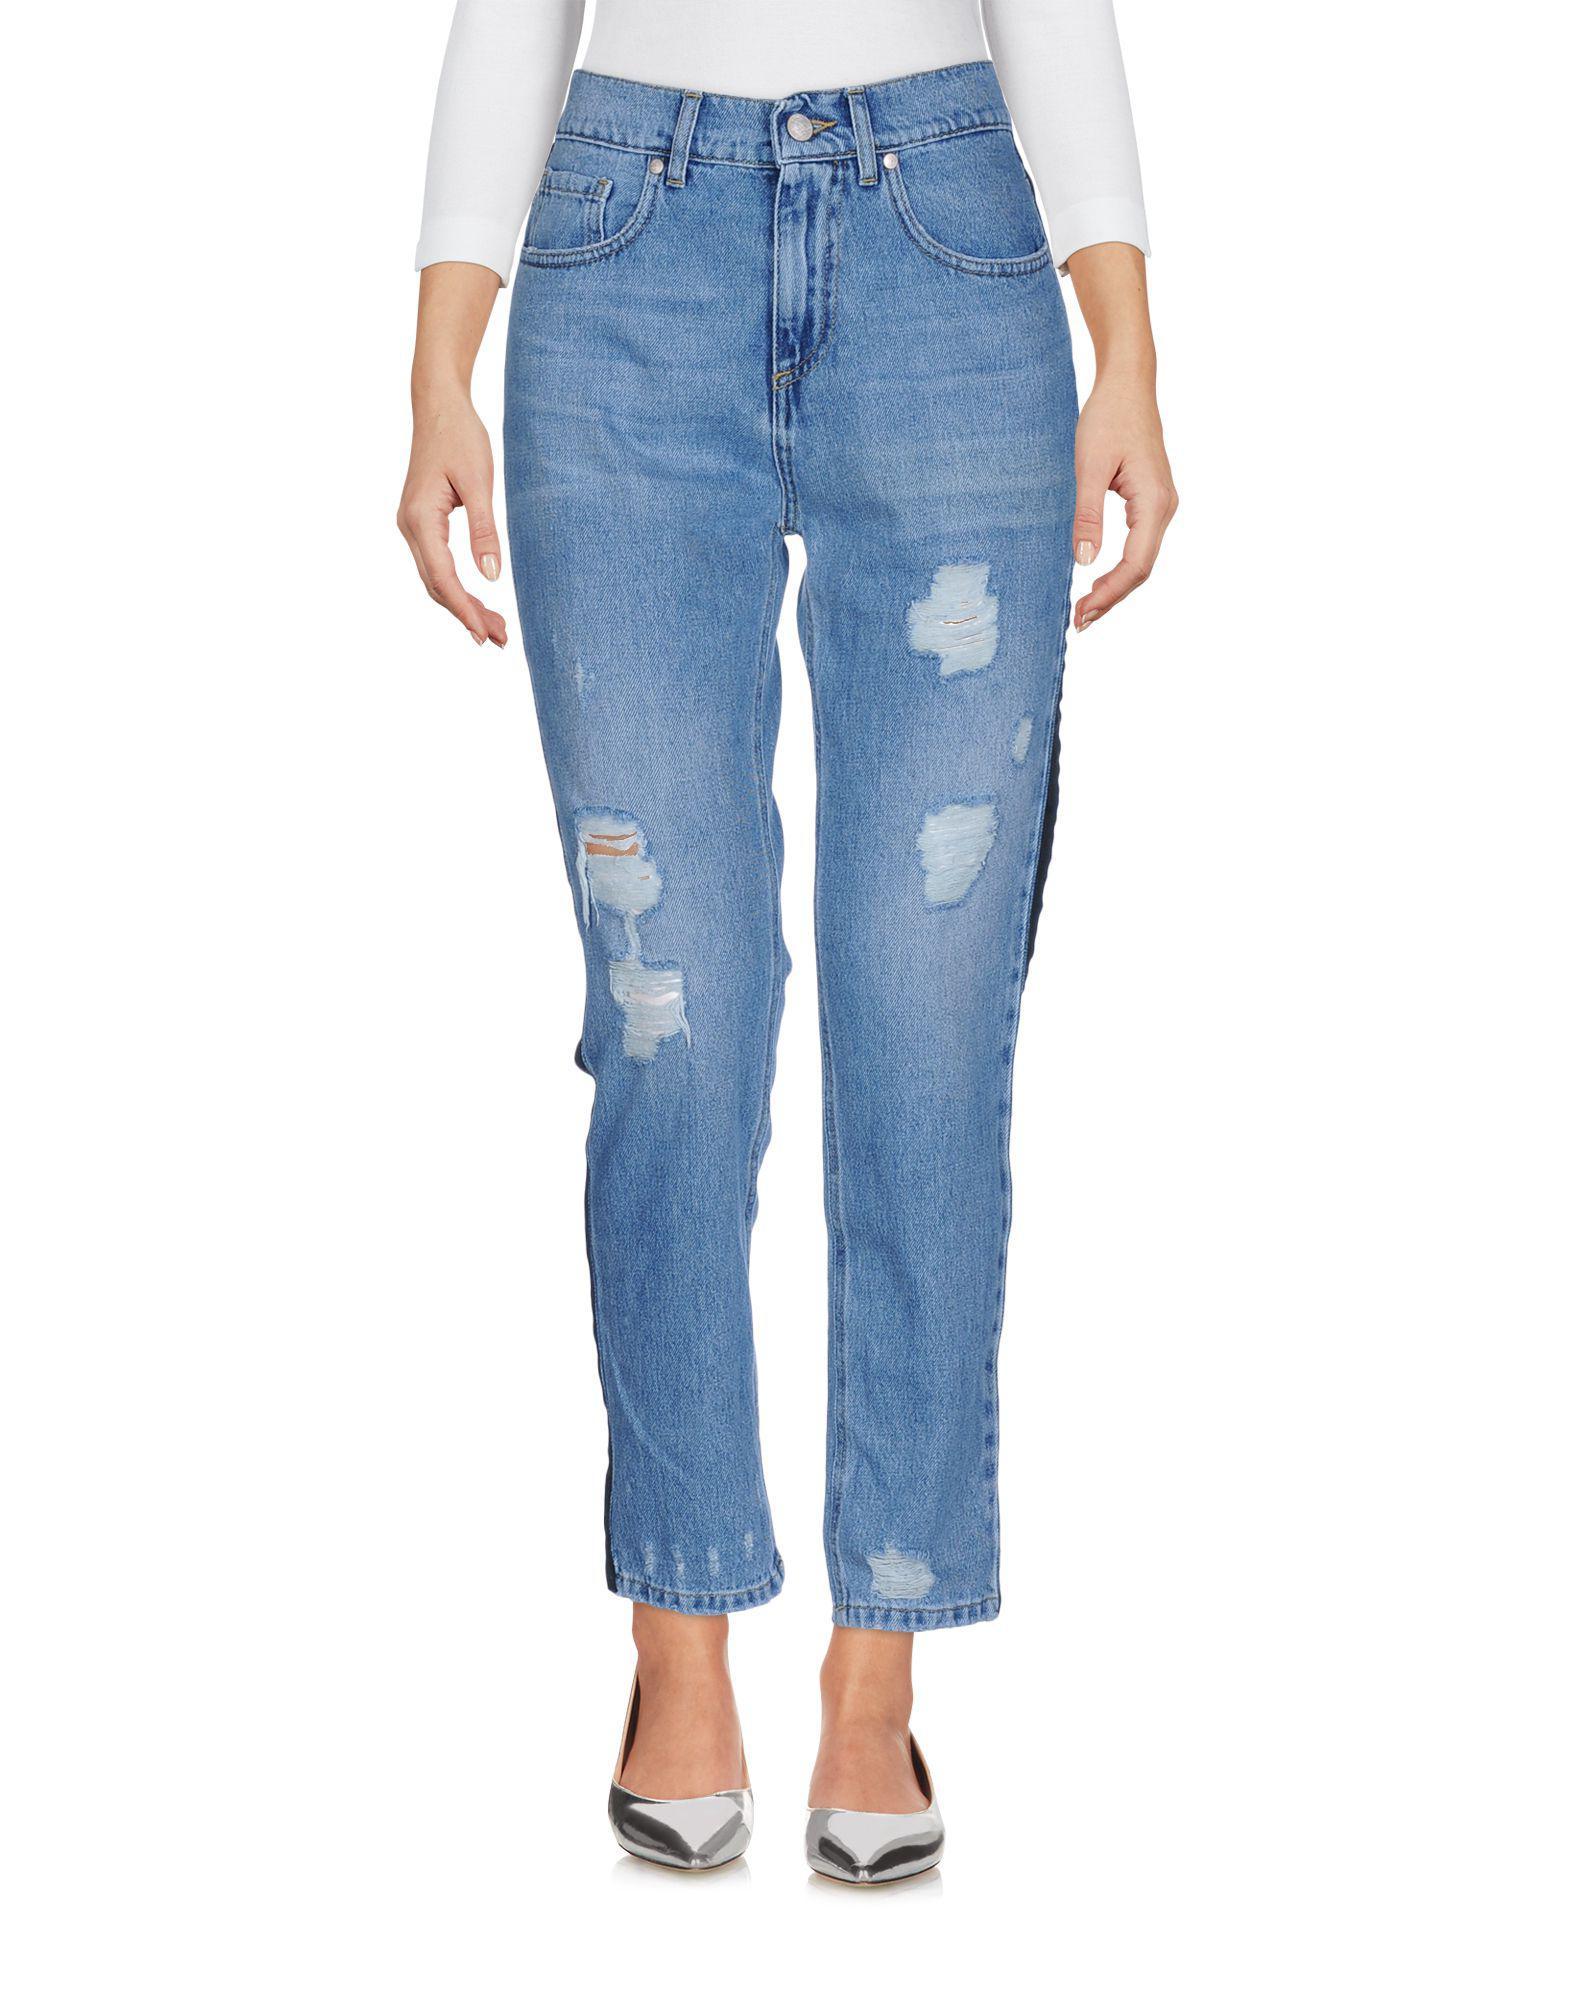 DENIM - Denim trousers Kaos Tb3N6vt3